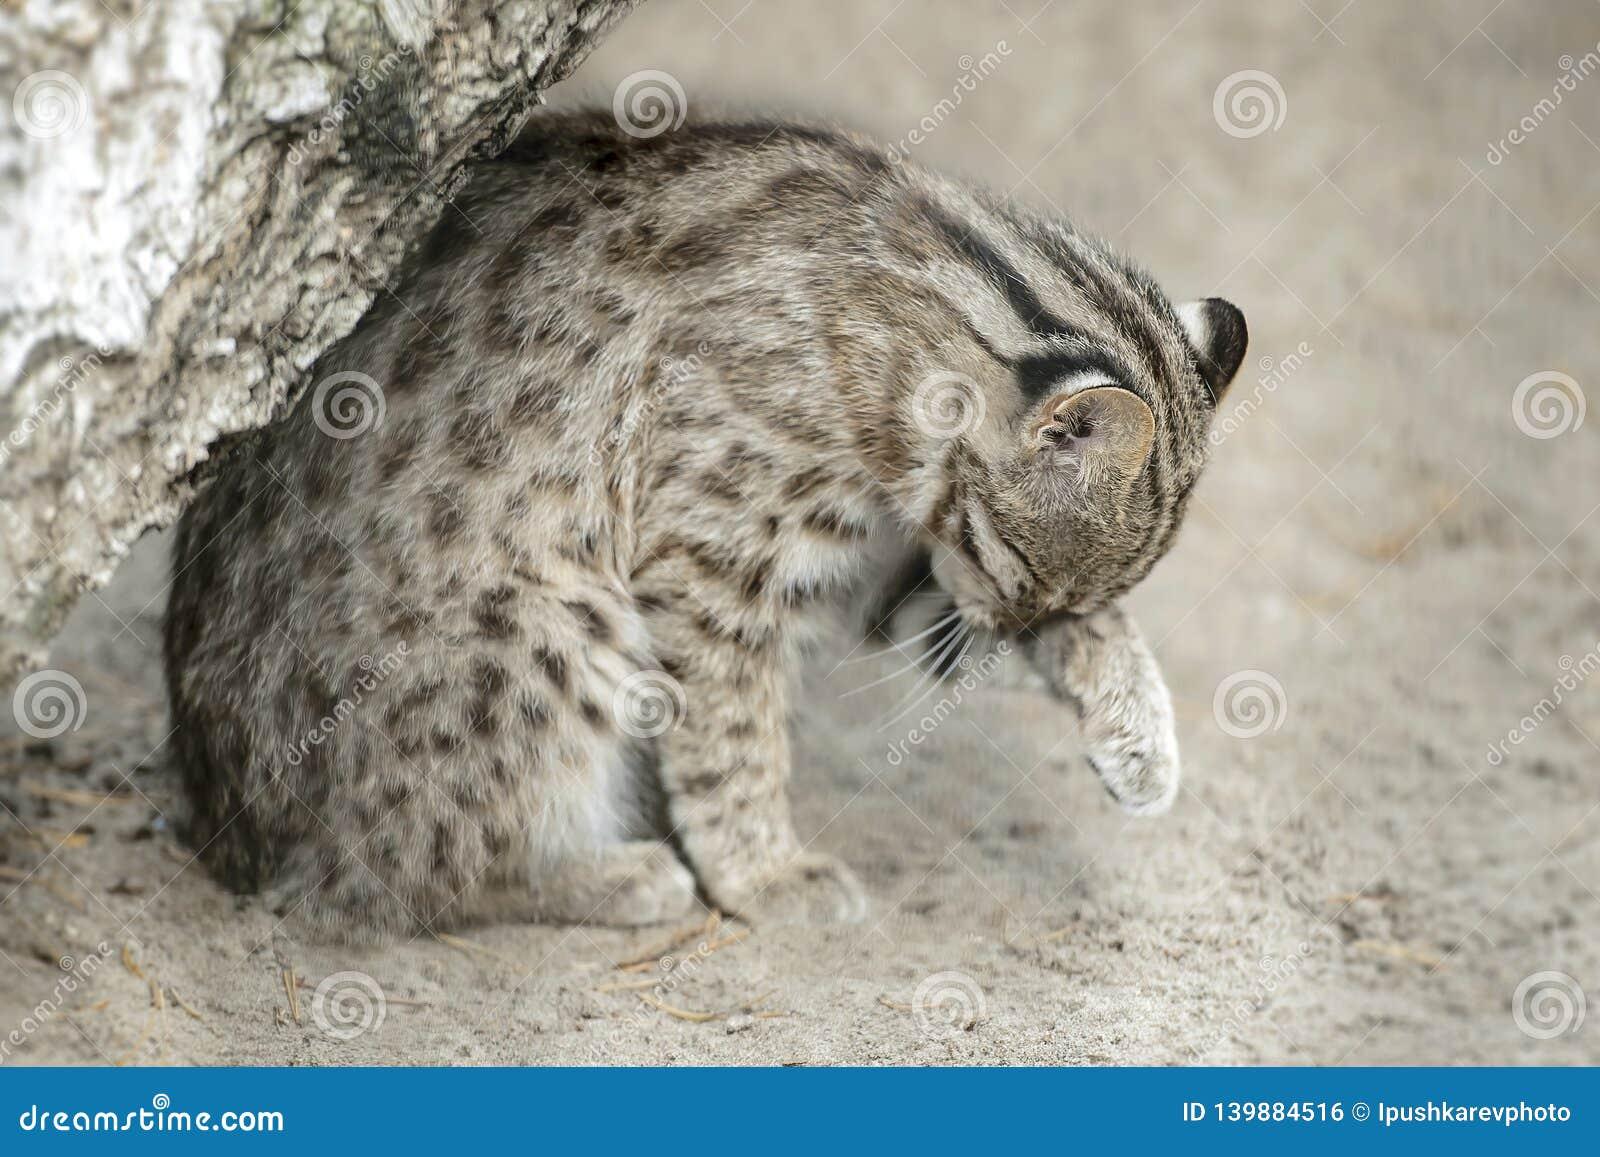 Leopard bengal cat. Prionailurus Felis bengalensis euptilura - wild animal live in tropical rain forest, South East Asia